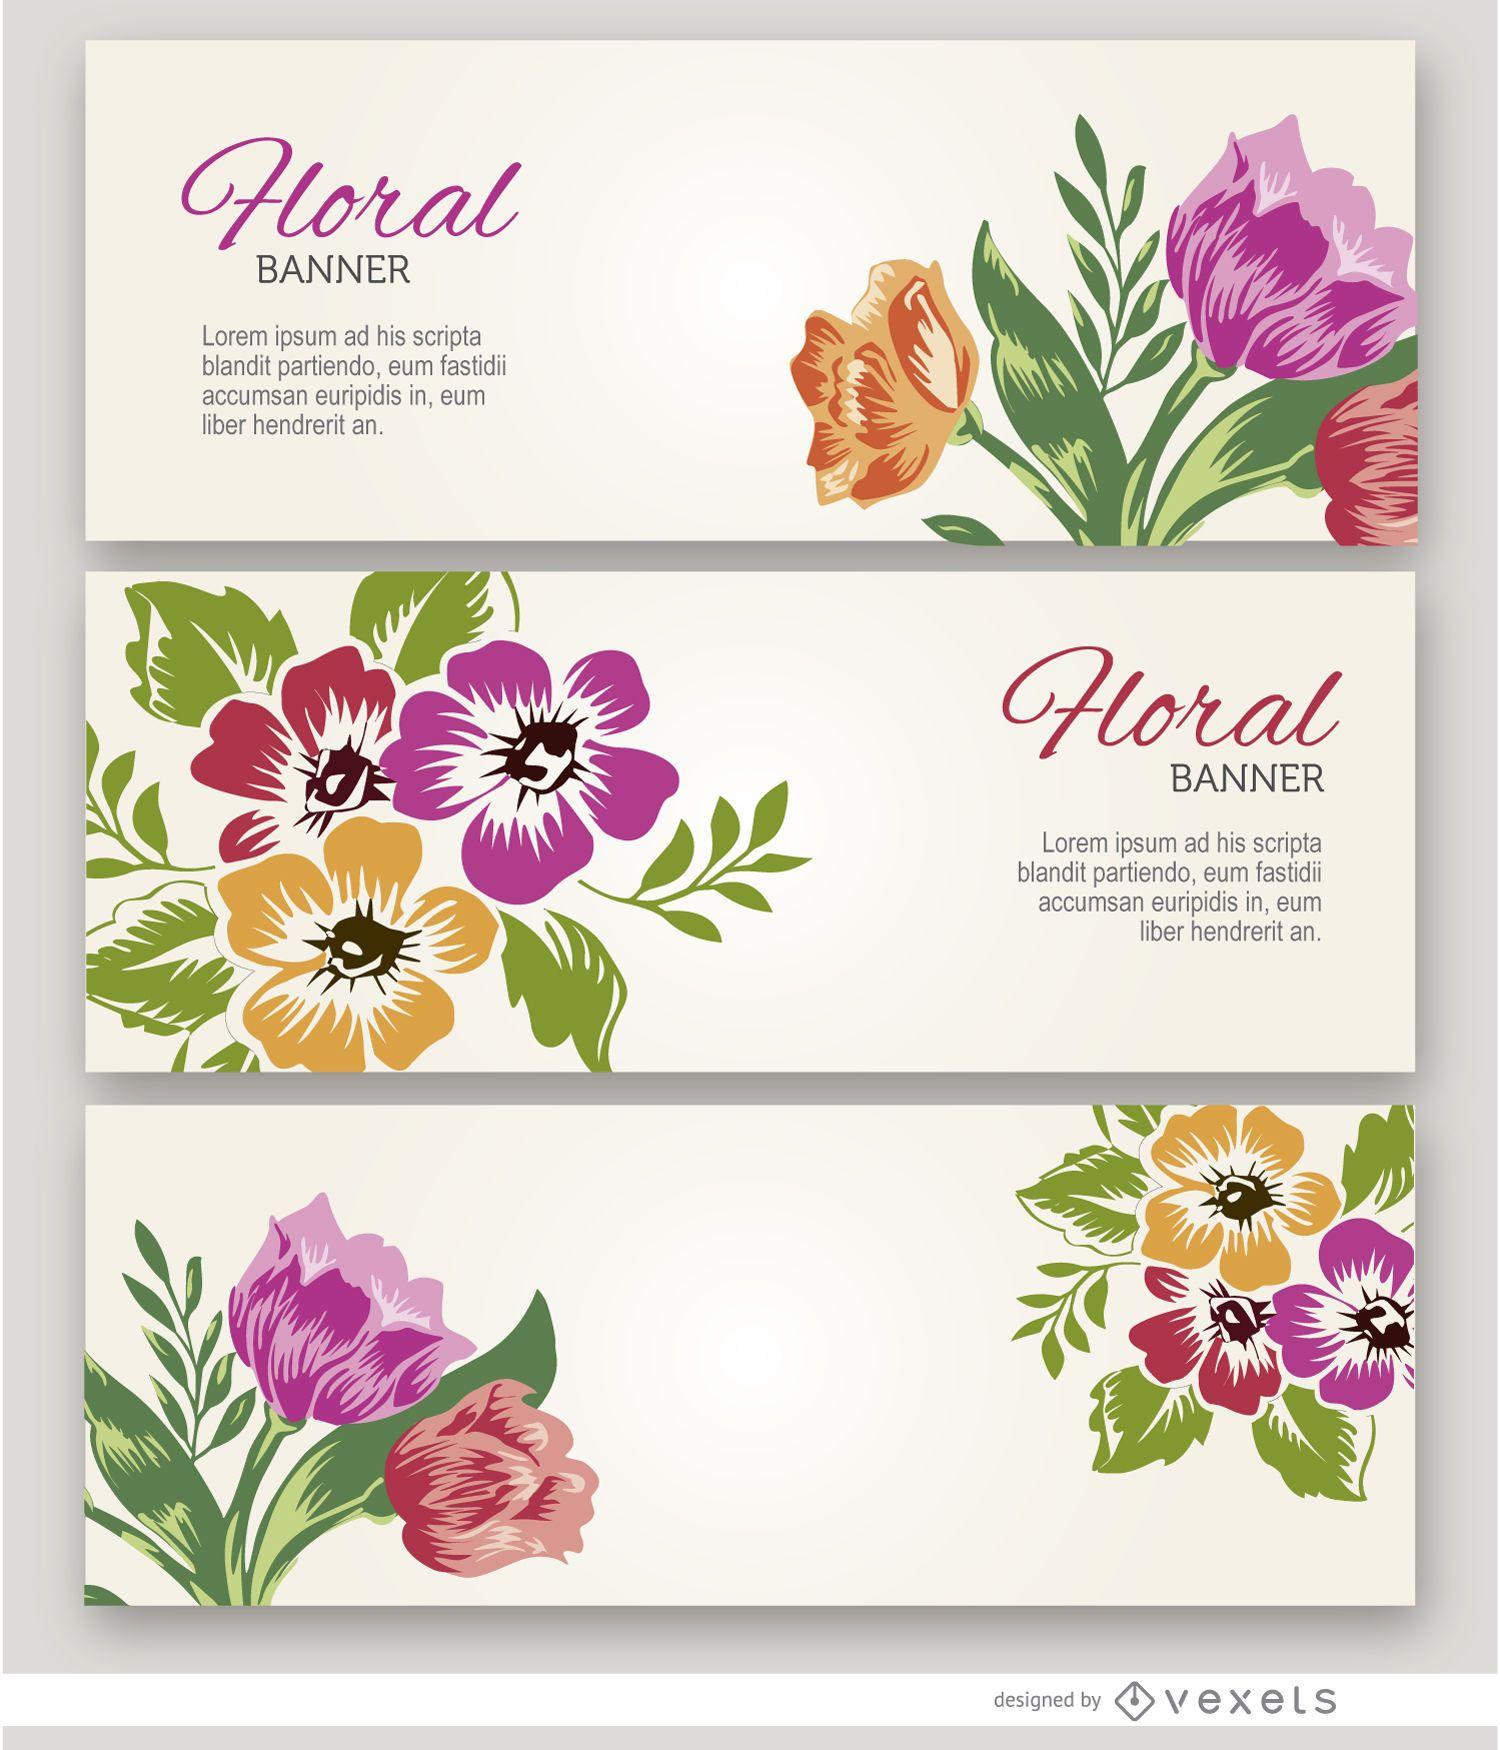 3 pancartas de flores pintadas